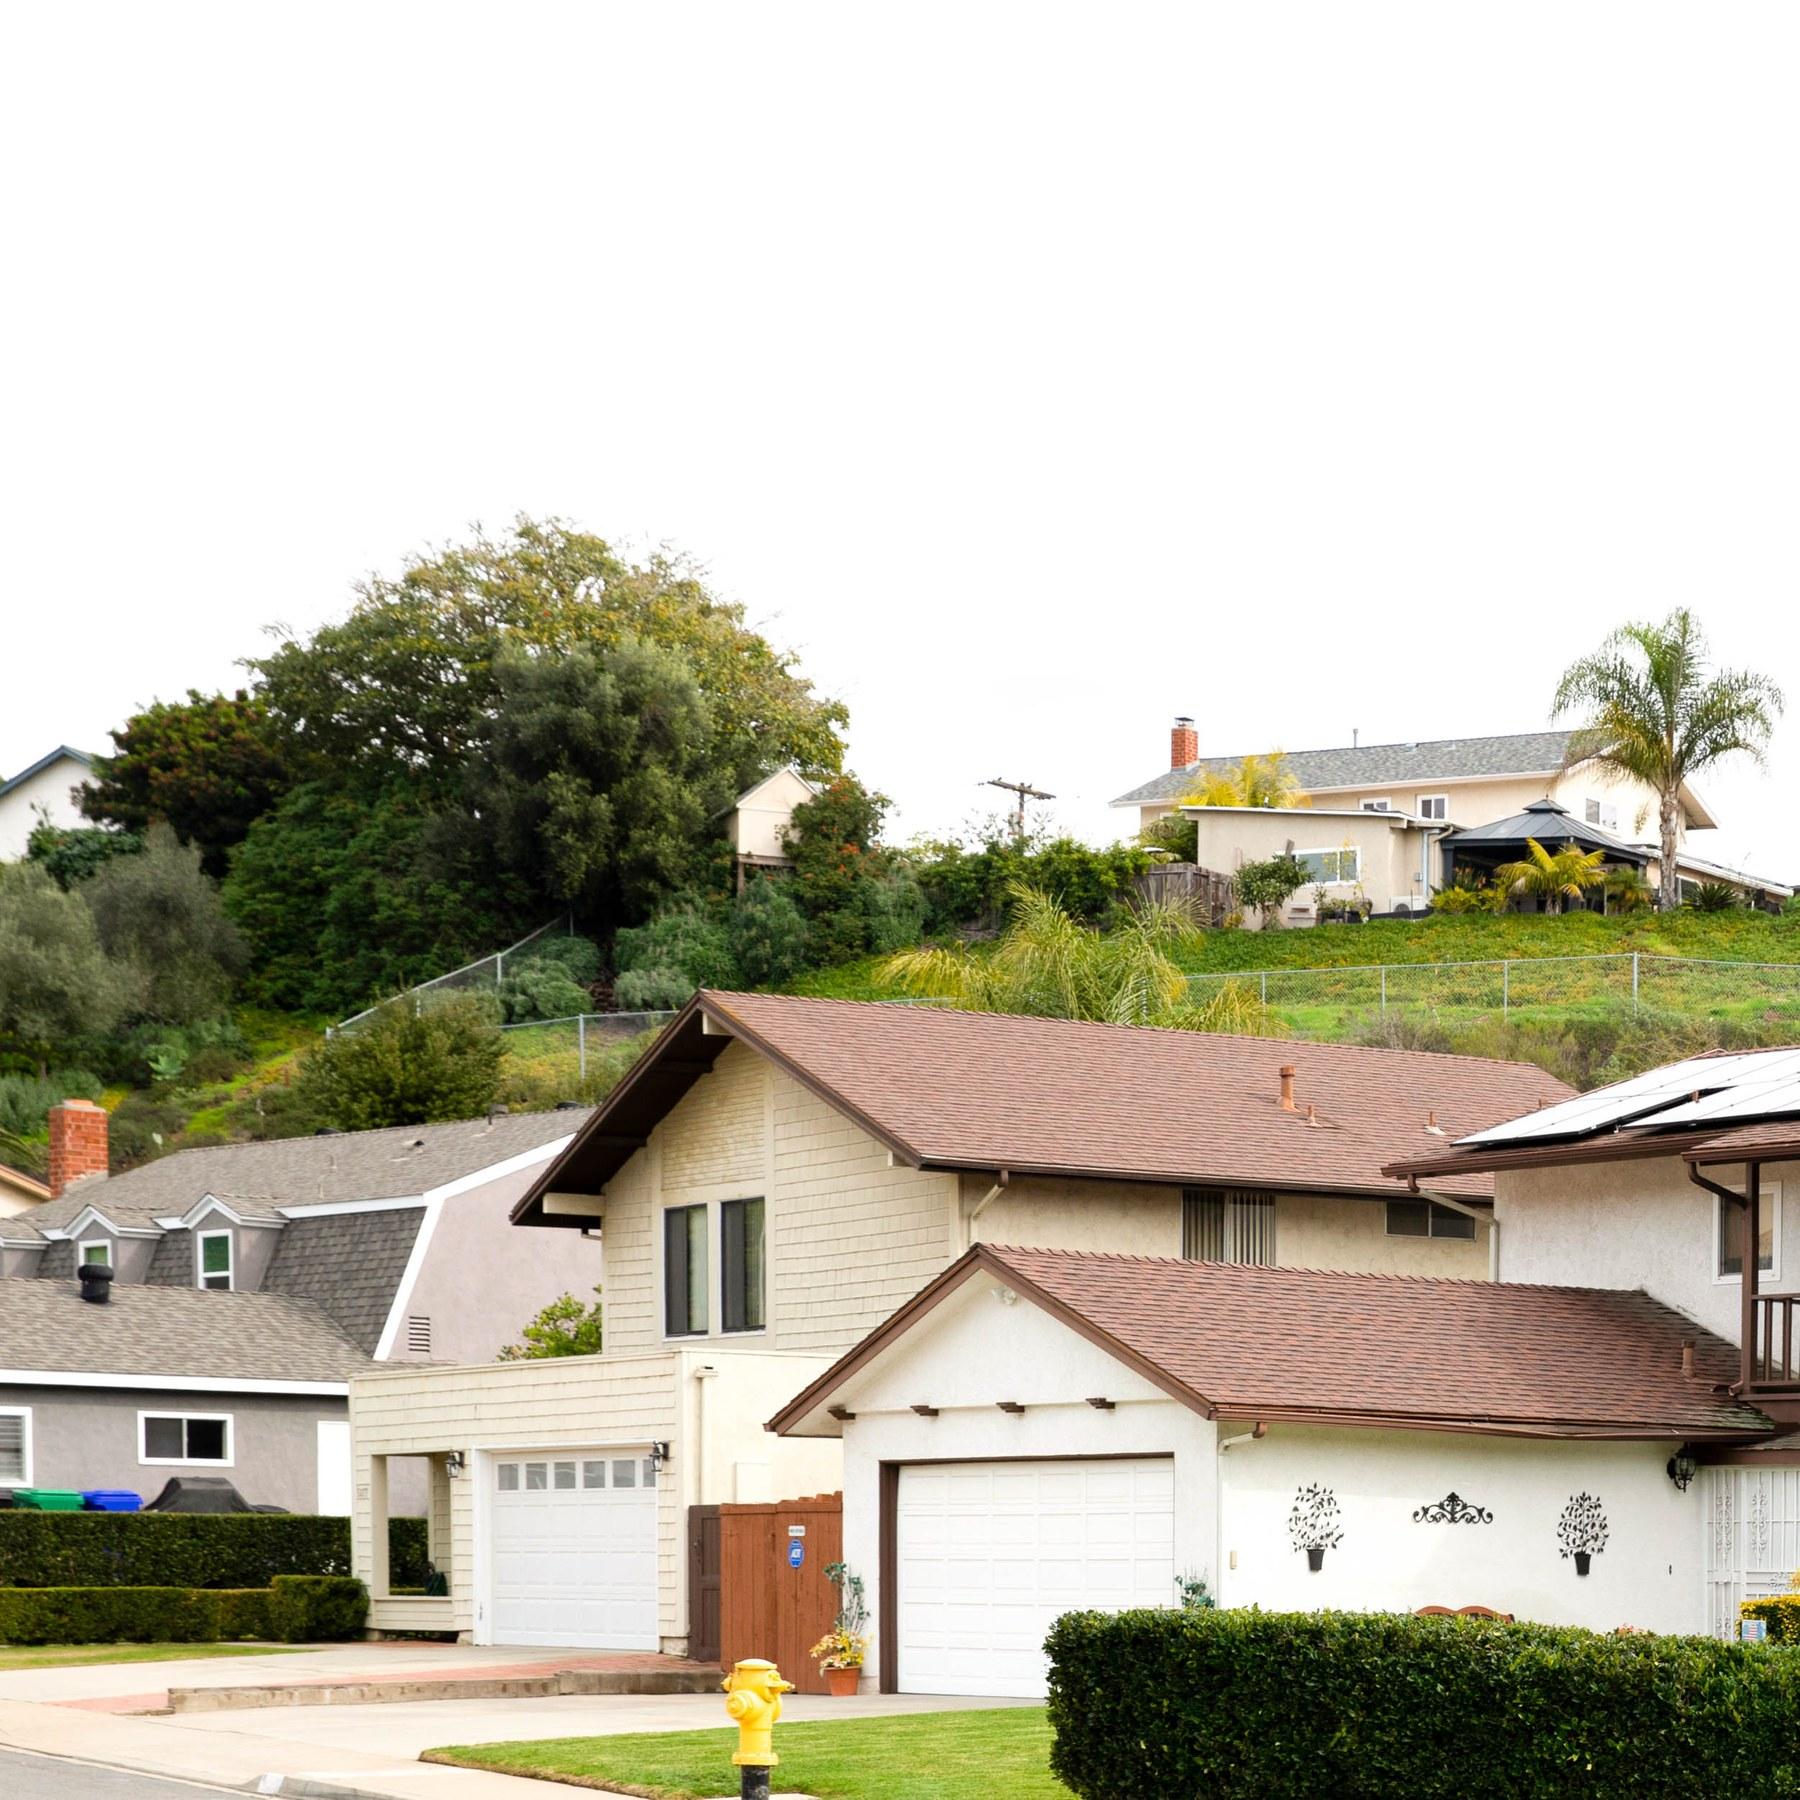 University City, San Diego CA - Neighborhood Guide